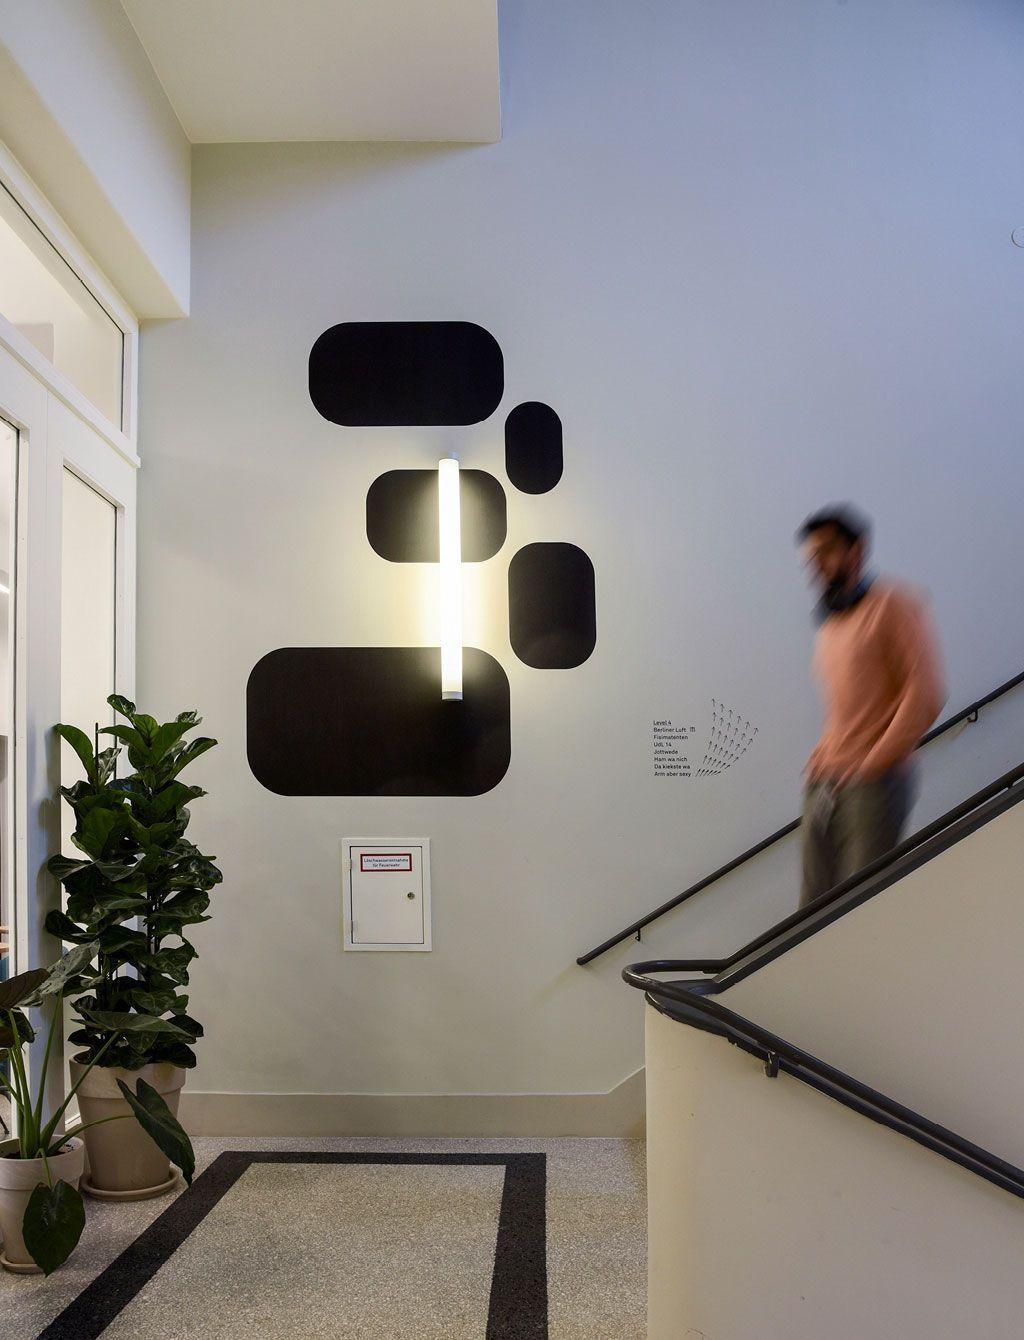 Signage And Orientation Spatial Design Wayfinding Signage